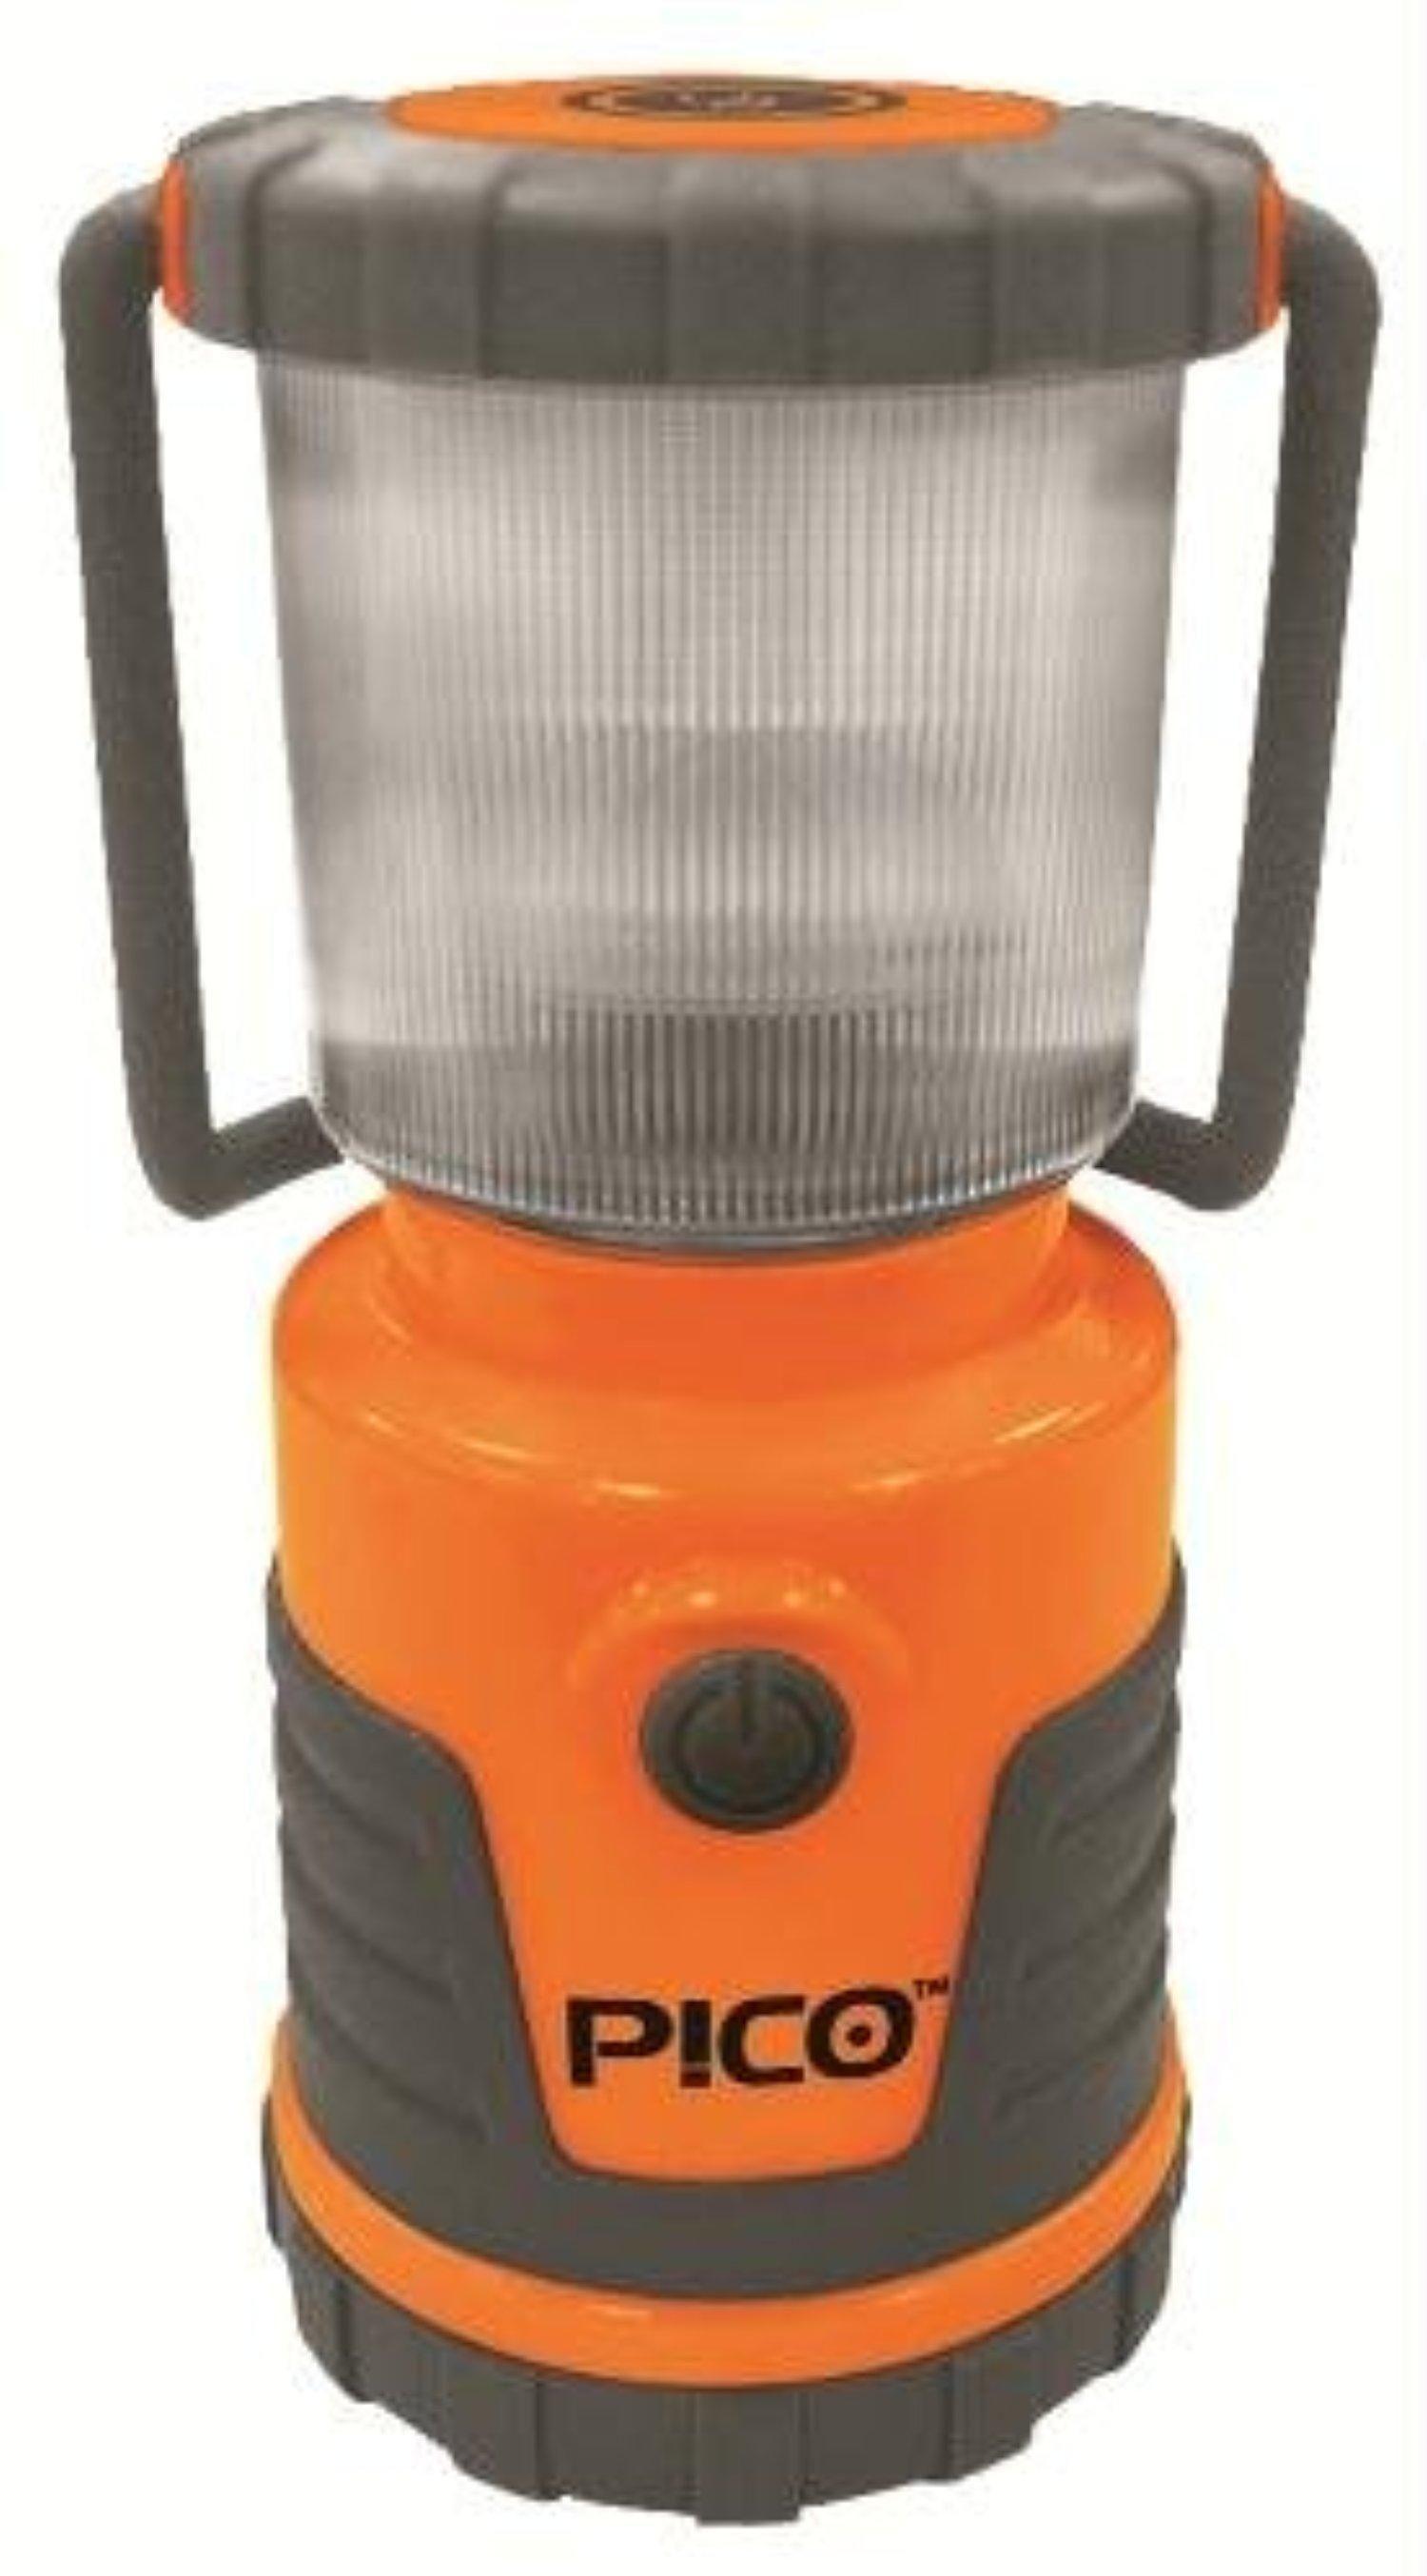 Brought to you by Avarsha.com: <div><div>UST Pico Lantern Orange</div><ul><li>Package Quantity: 1</li><li>Excellent Quality.</li><li>Great Gift Idea.</li><li>Satisfaction Ensured.</li><li>Produced with the highest grade materials</li></ul><div>Package Quantity: 1</div><div>Ultimatesurv</div></div>